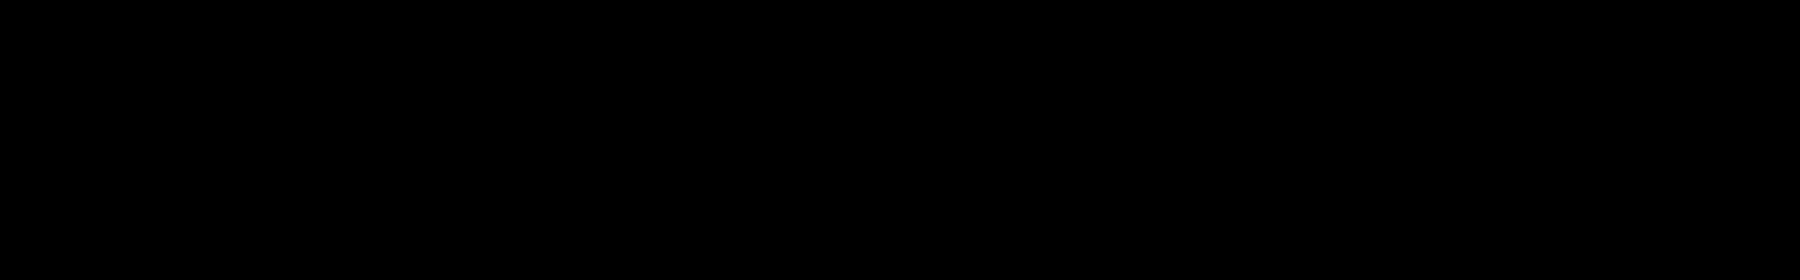 Boiler Techno audio waveform